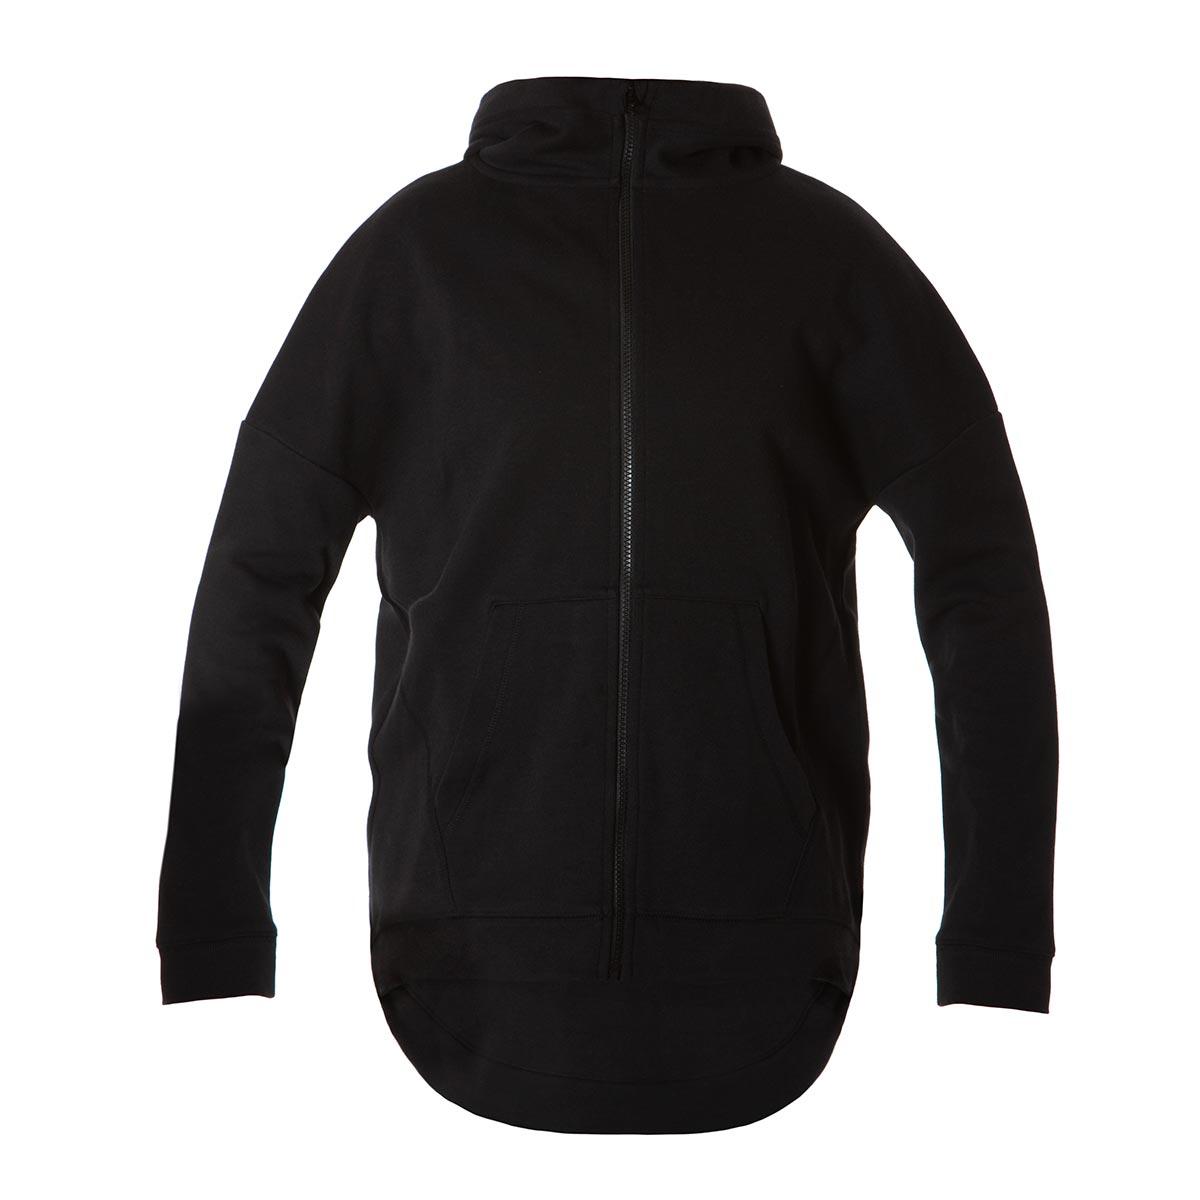 Jordan Jacket in Black